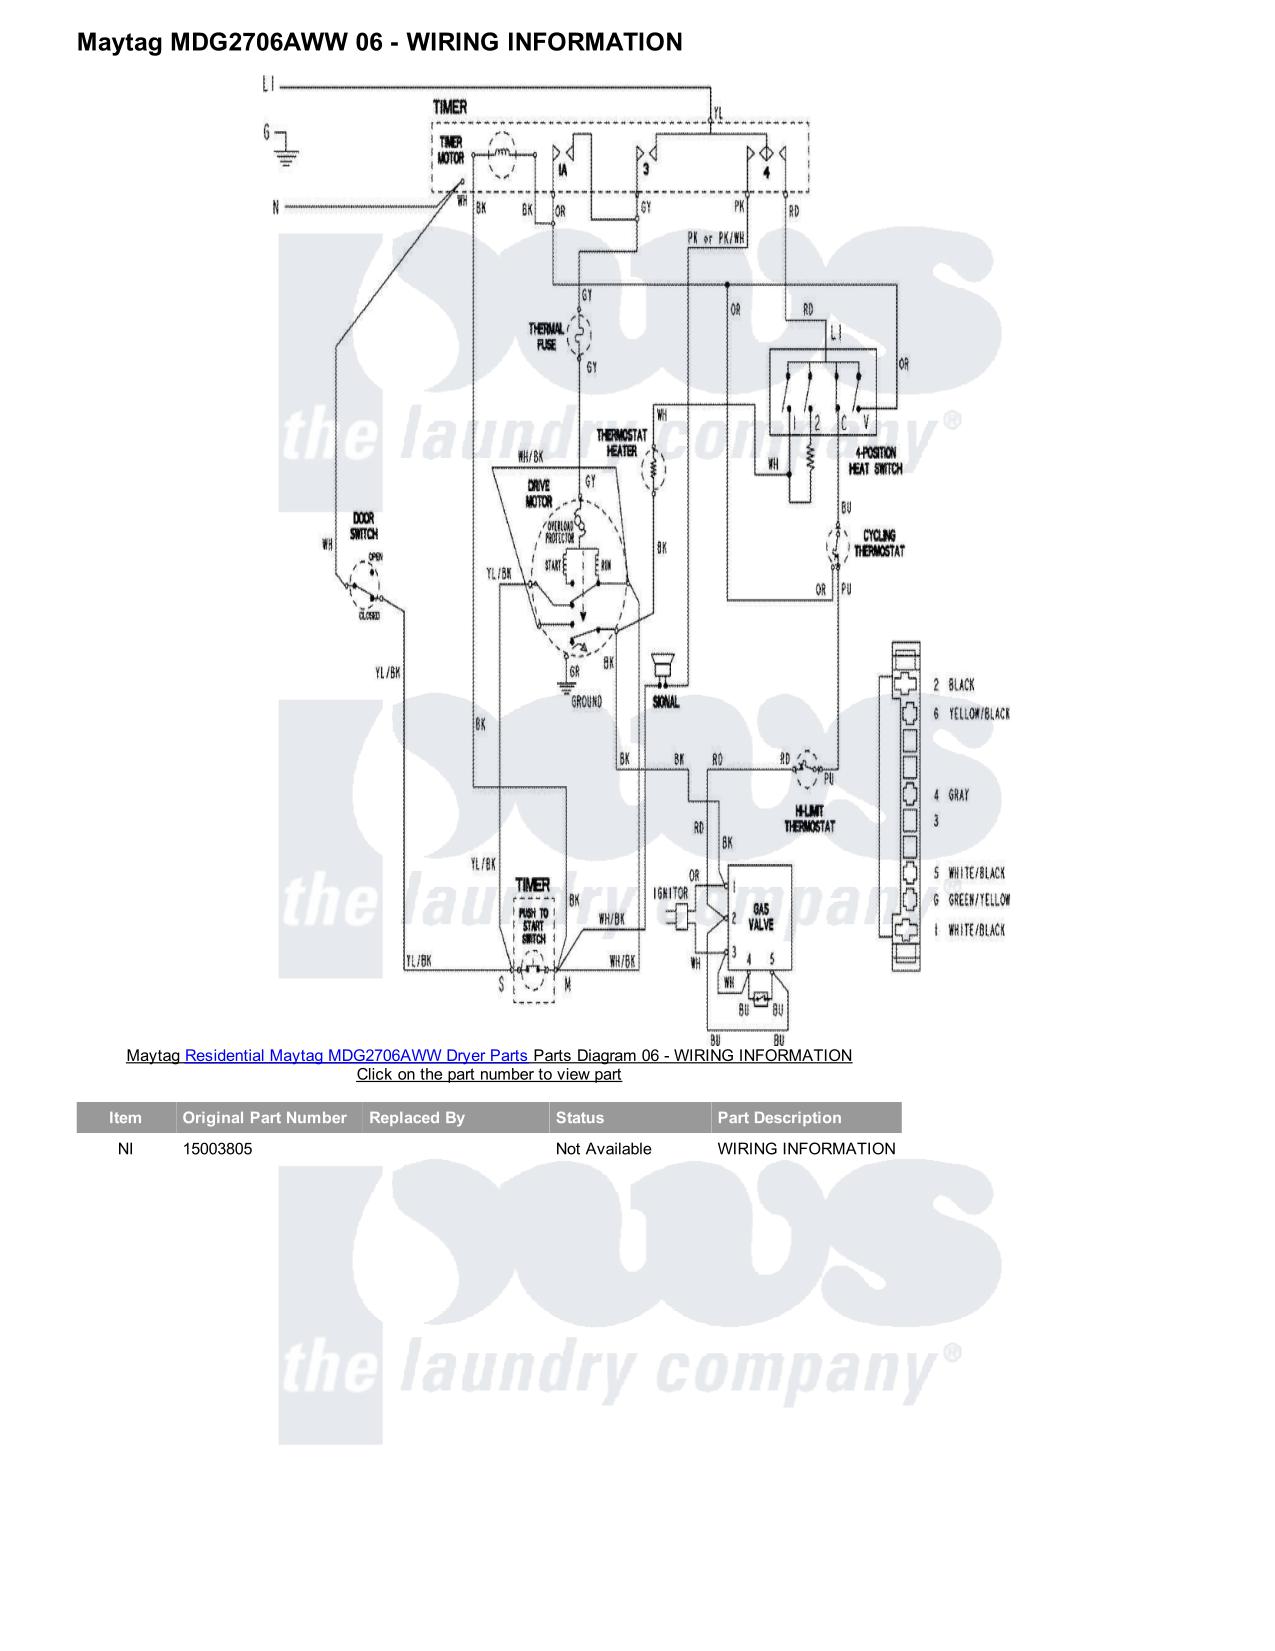 28 Wiring Diagram For Maytag Dryer Motor